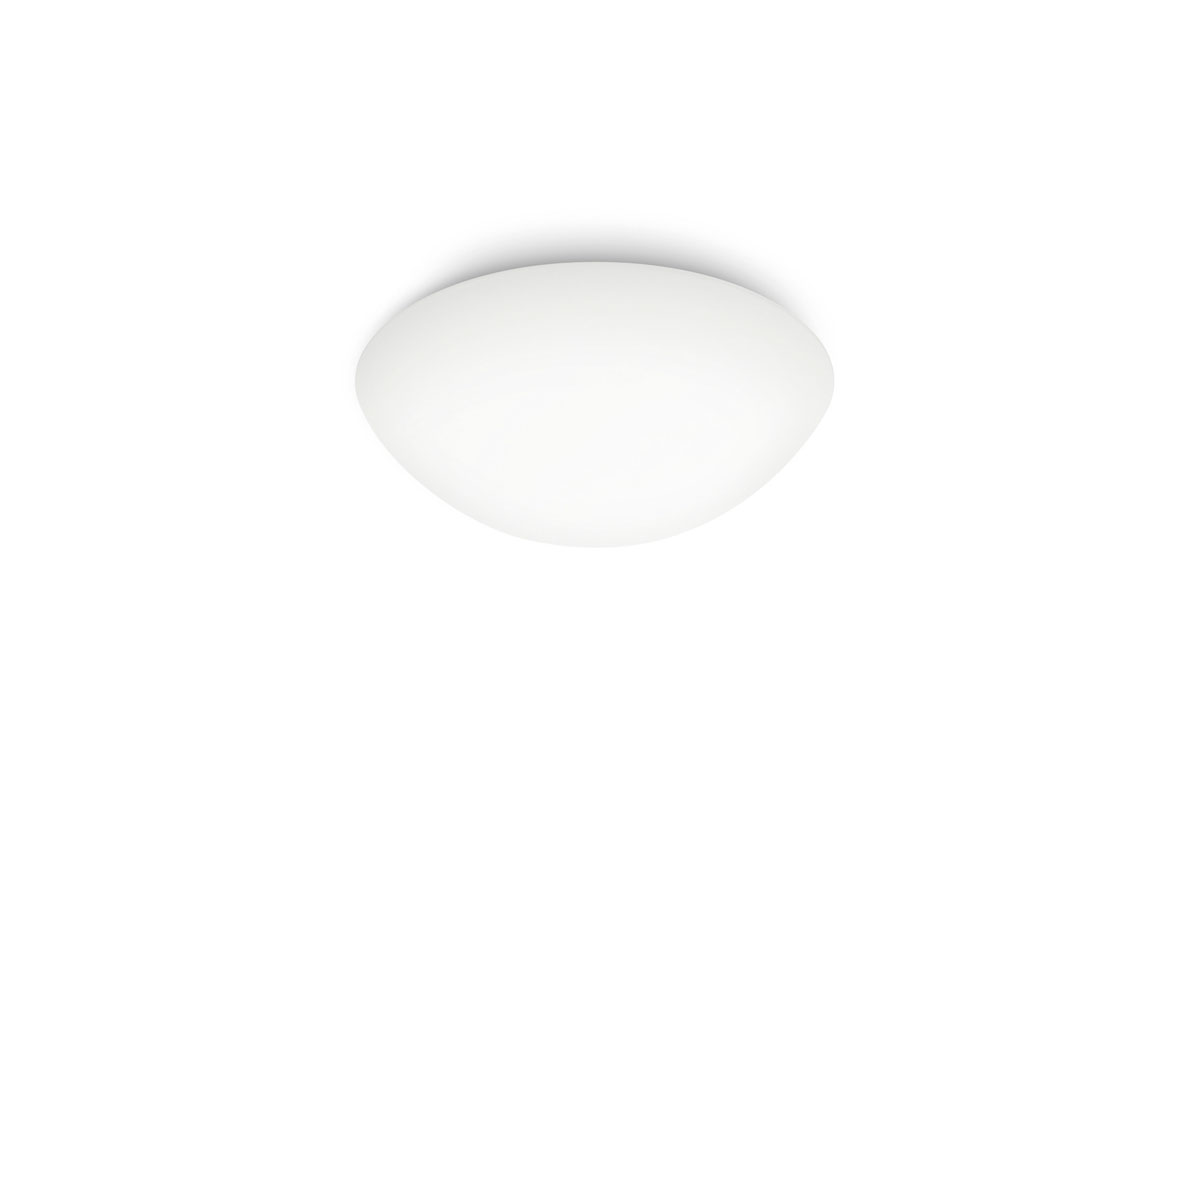 philips mybathroom spa plafondlamp wit. Black Bedroom Furniture Sets. Home Design Ideas